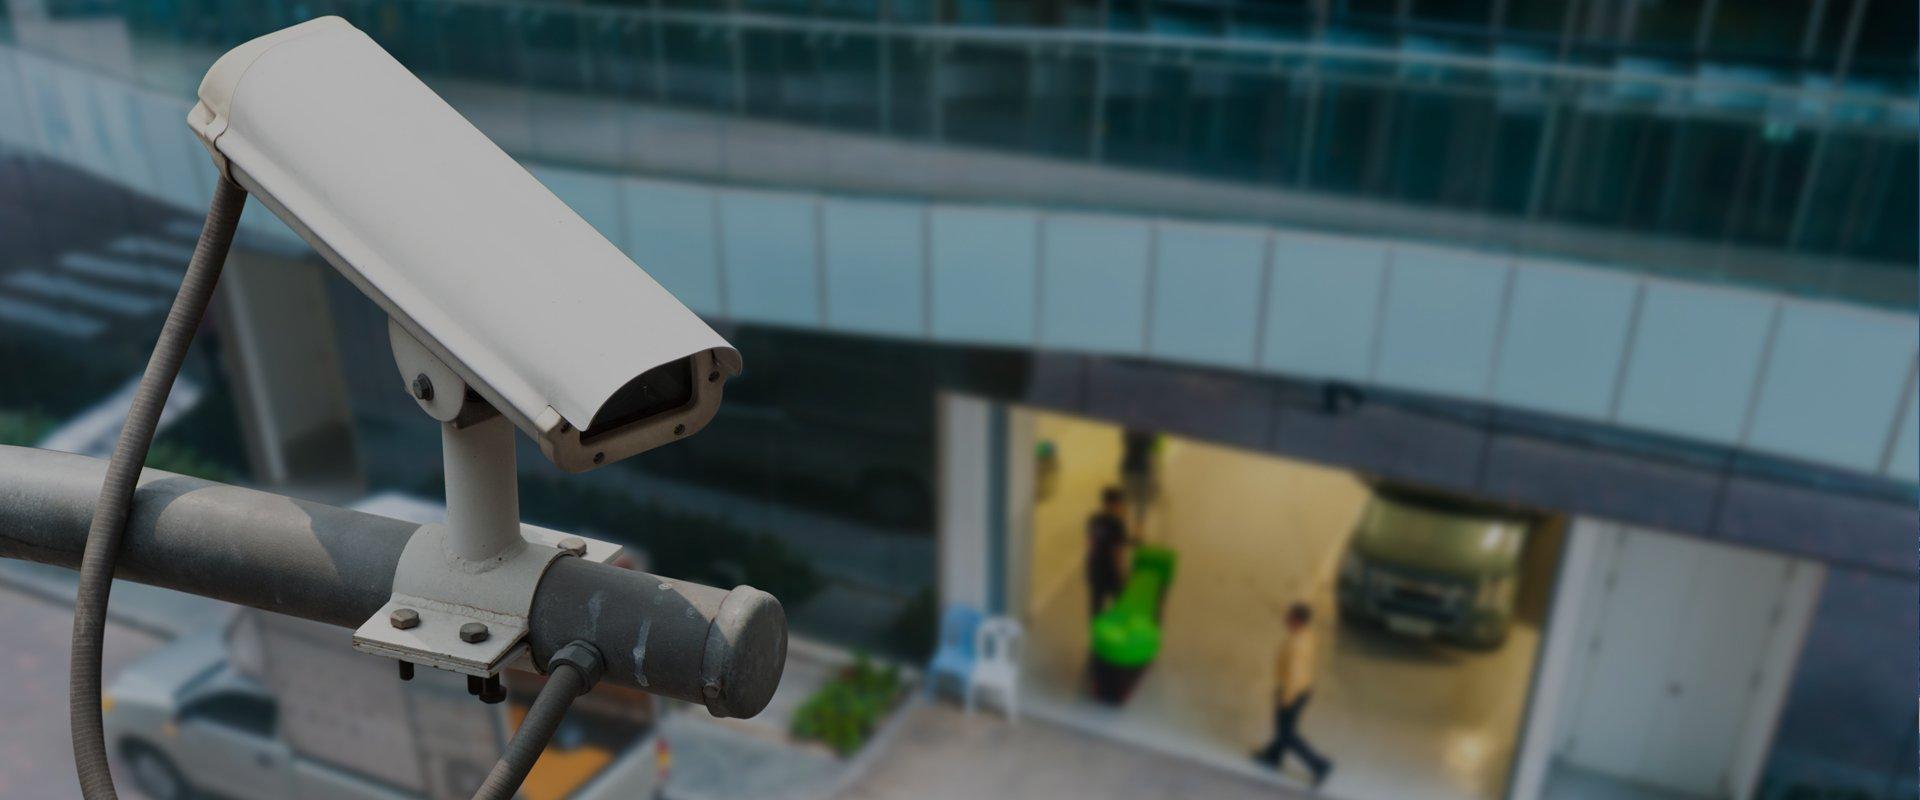 CCTV specialists